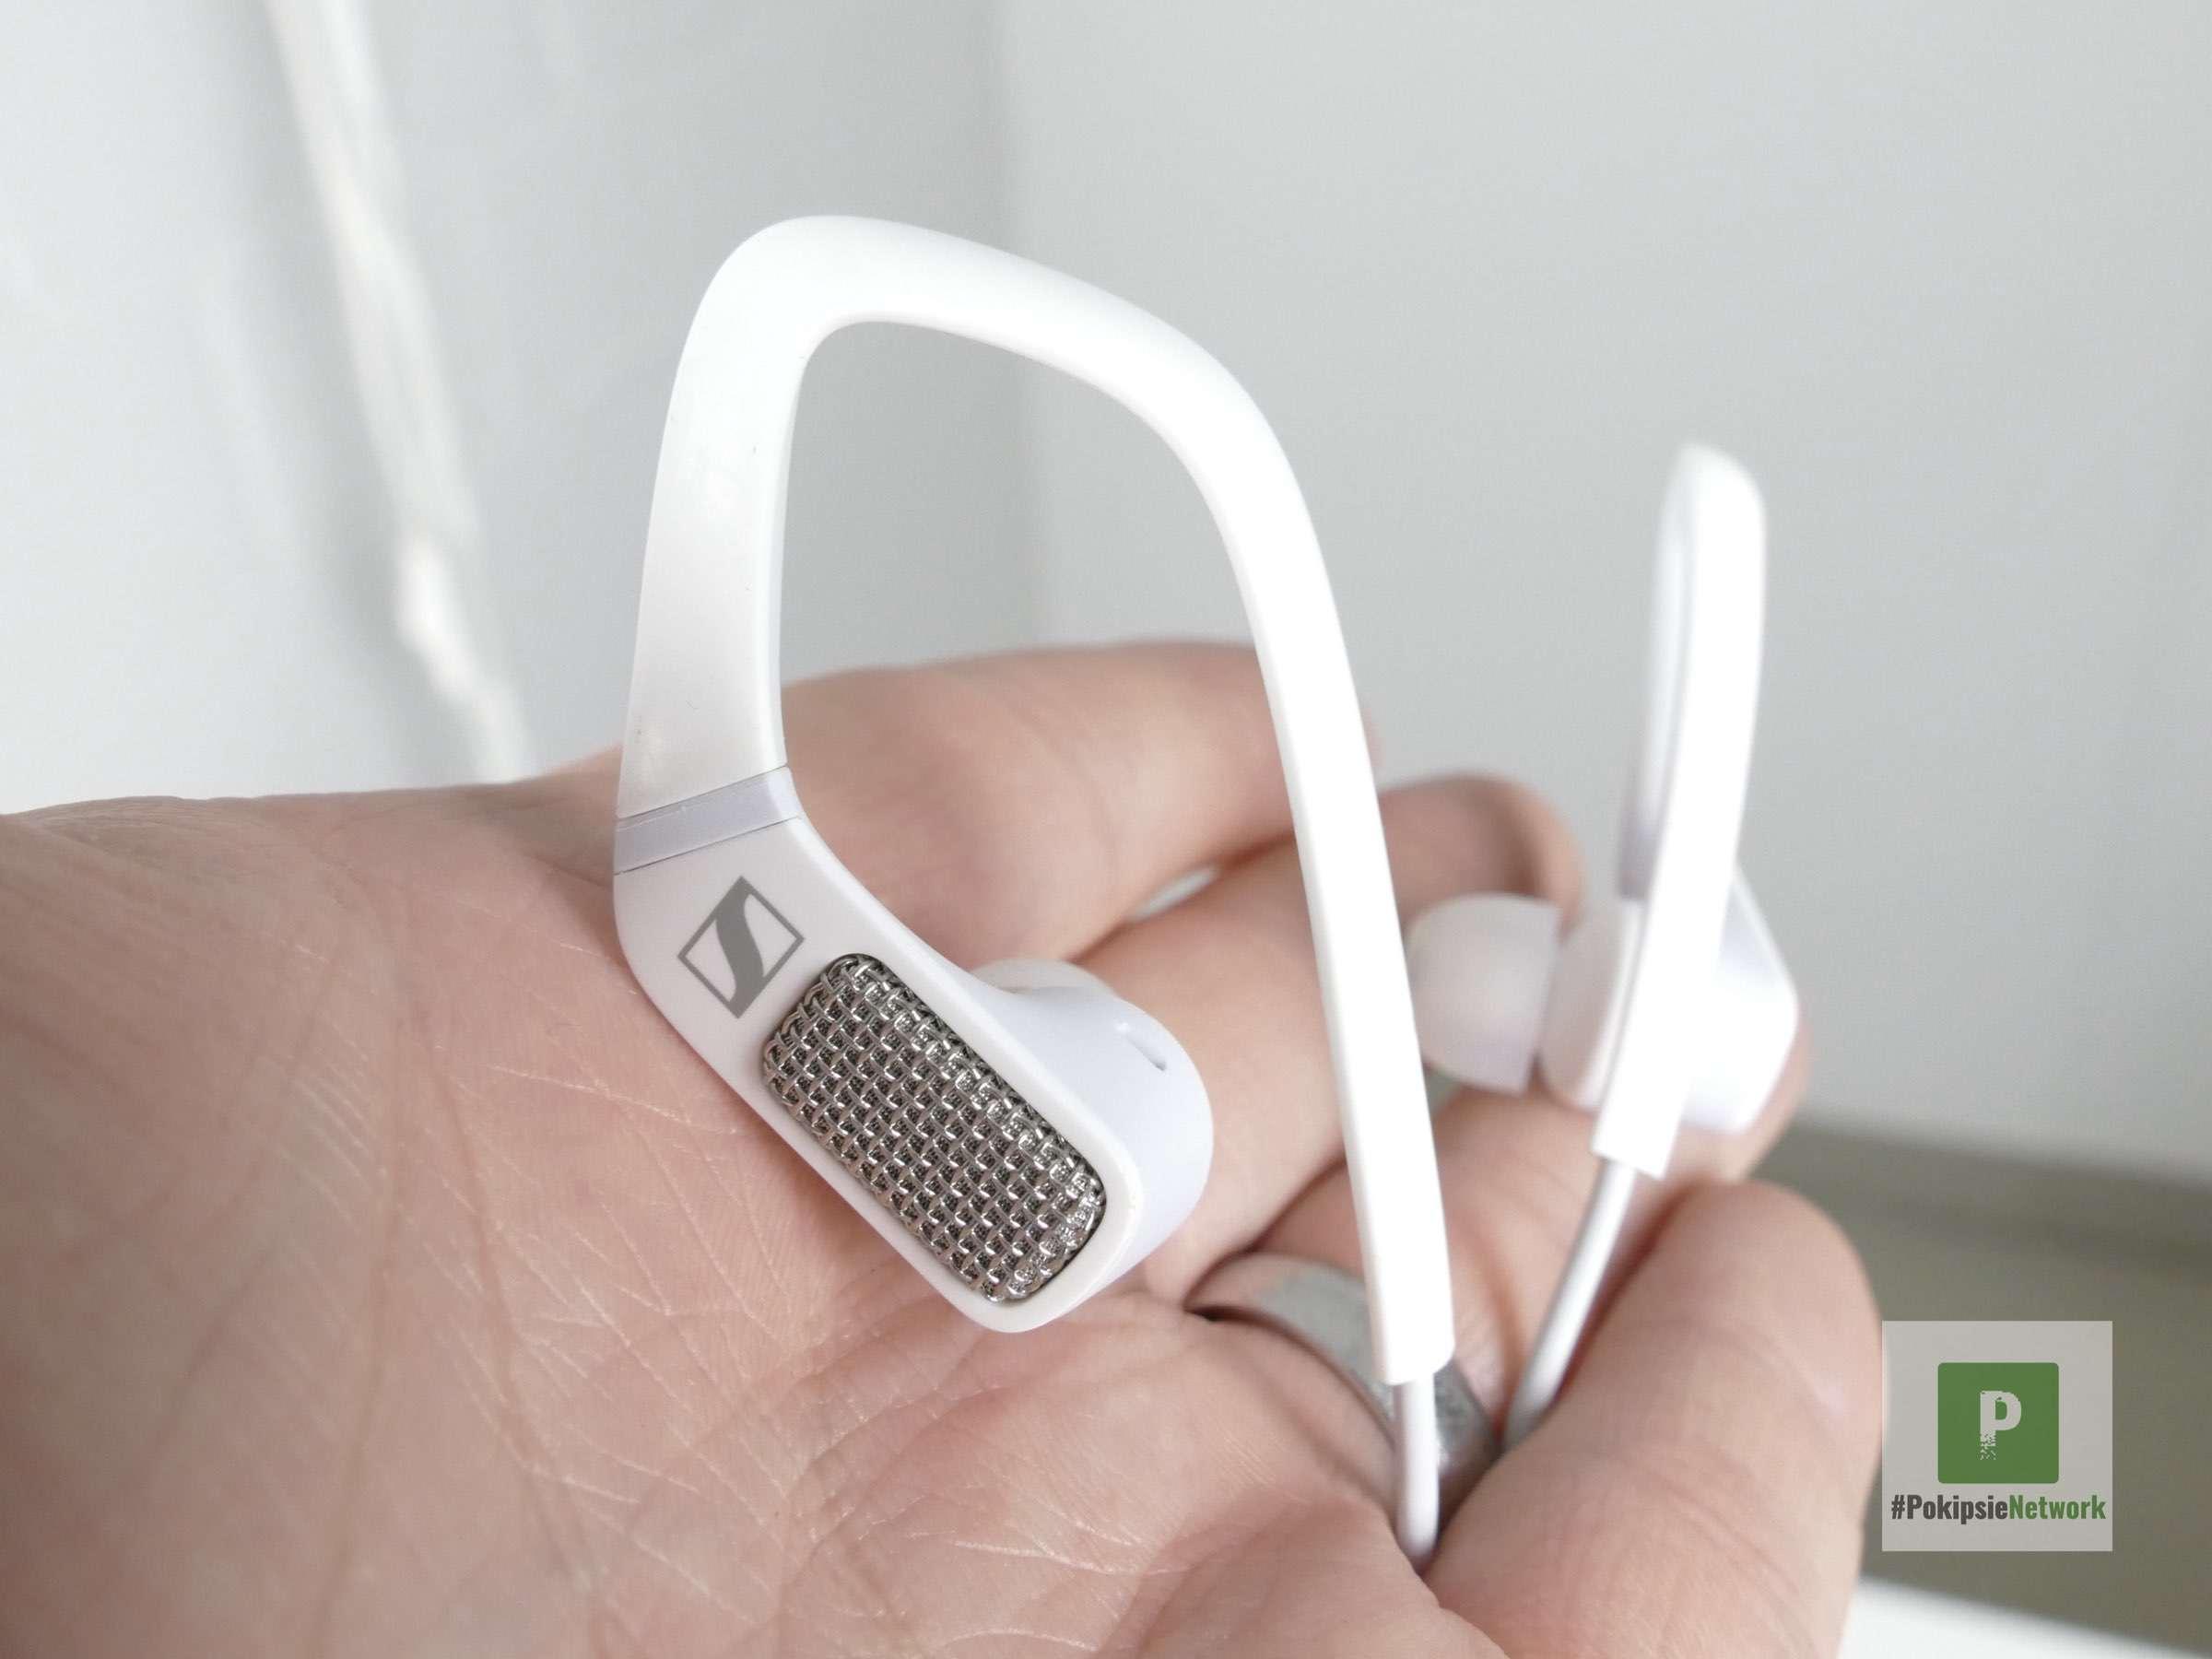 Das verbauten 360 (180) Grad Mikrofon